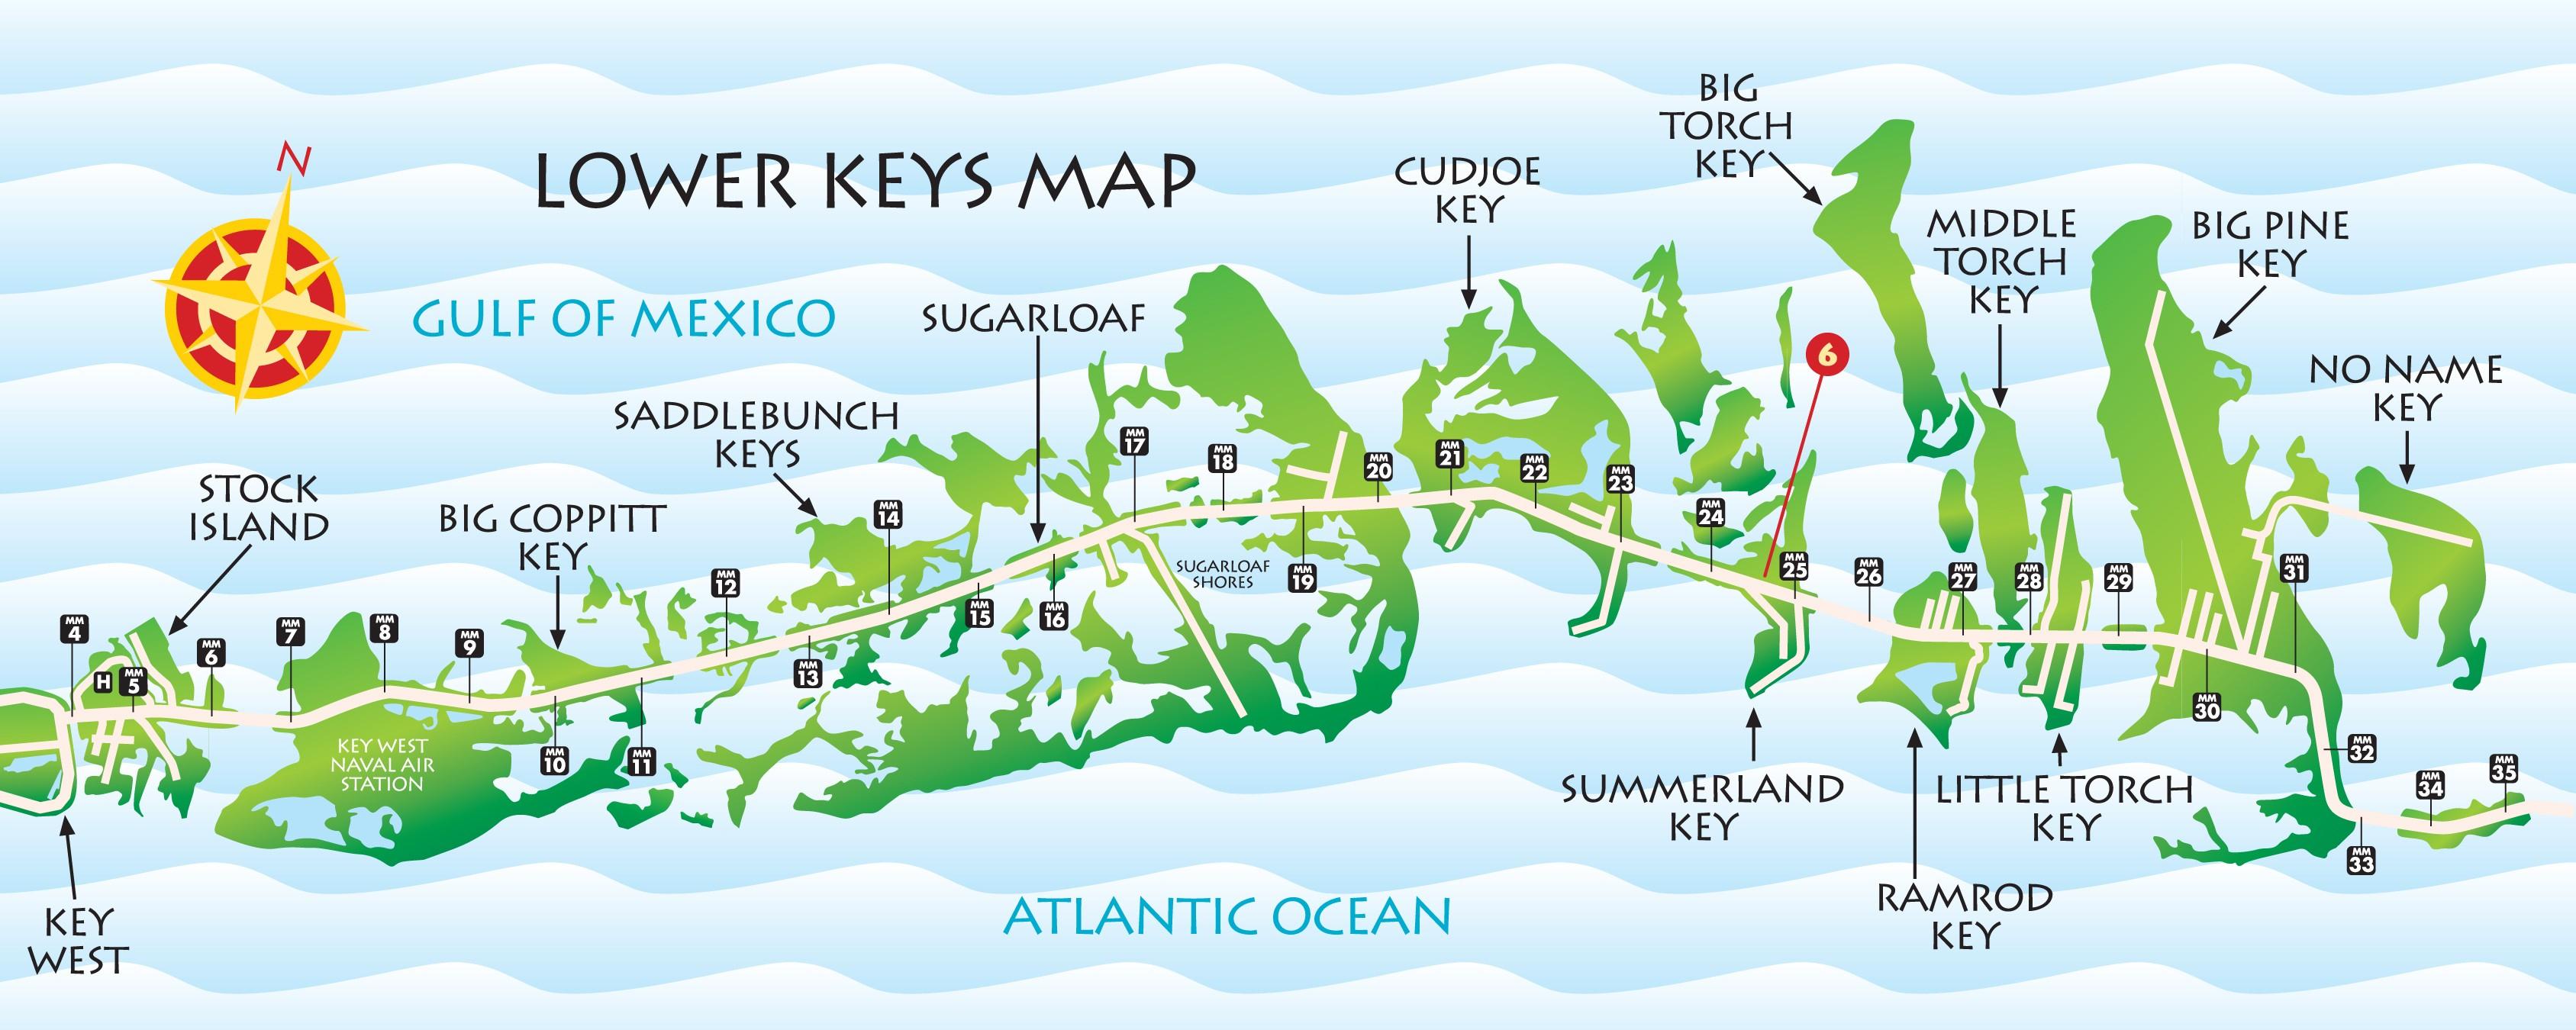 Lower Keys Map | Key West / Florida Keys Money Saving Discount Coupons - Map Of Lower Florida Keys